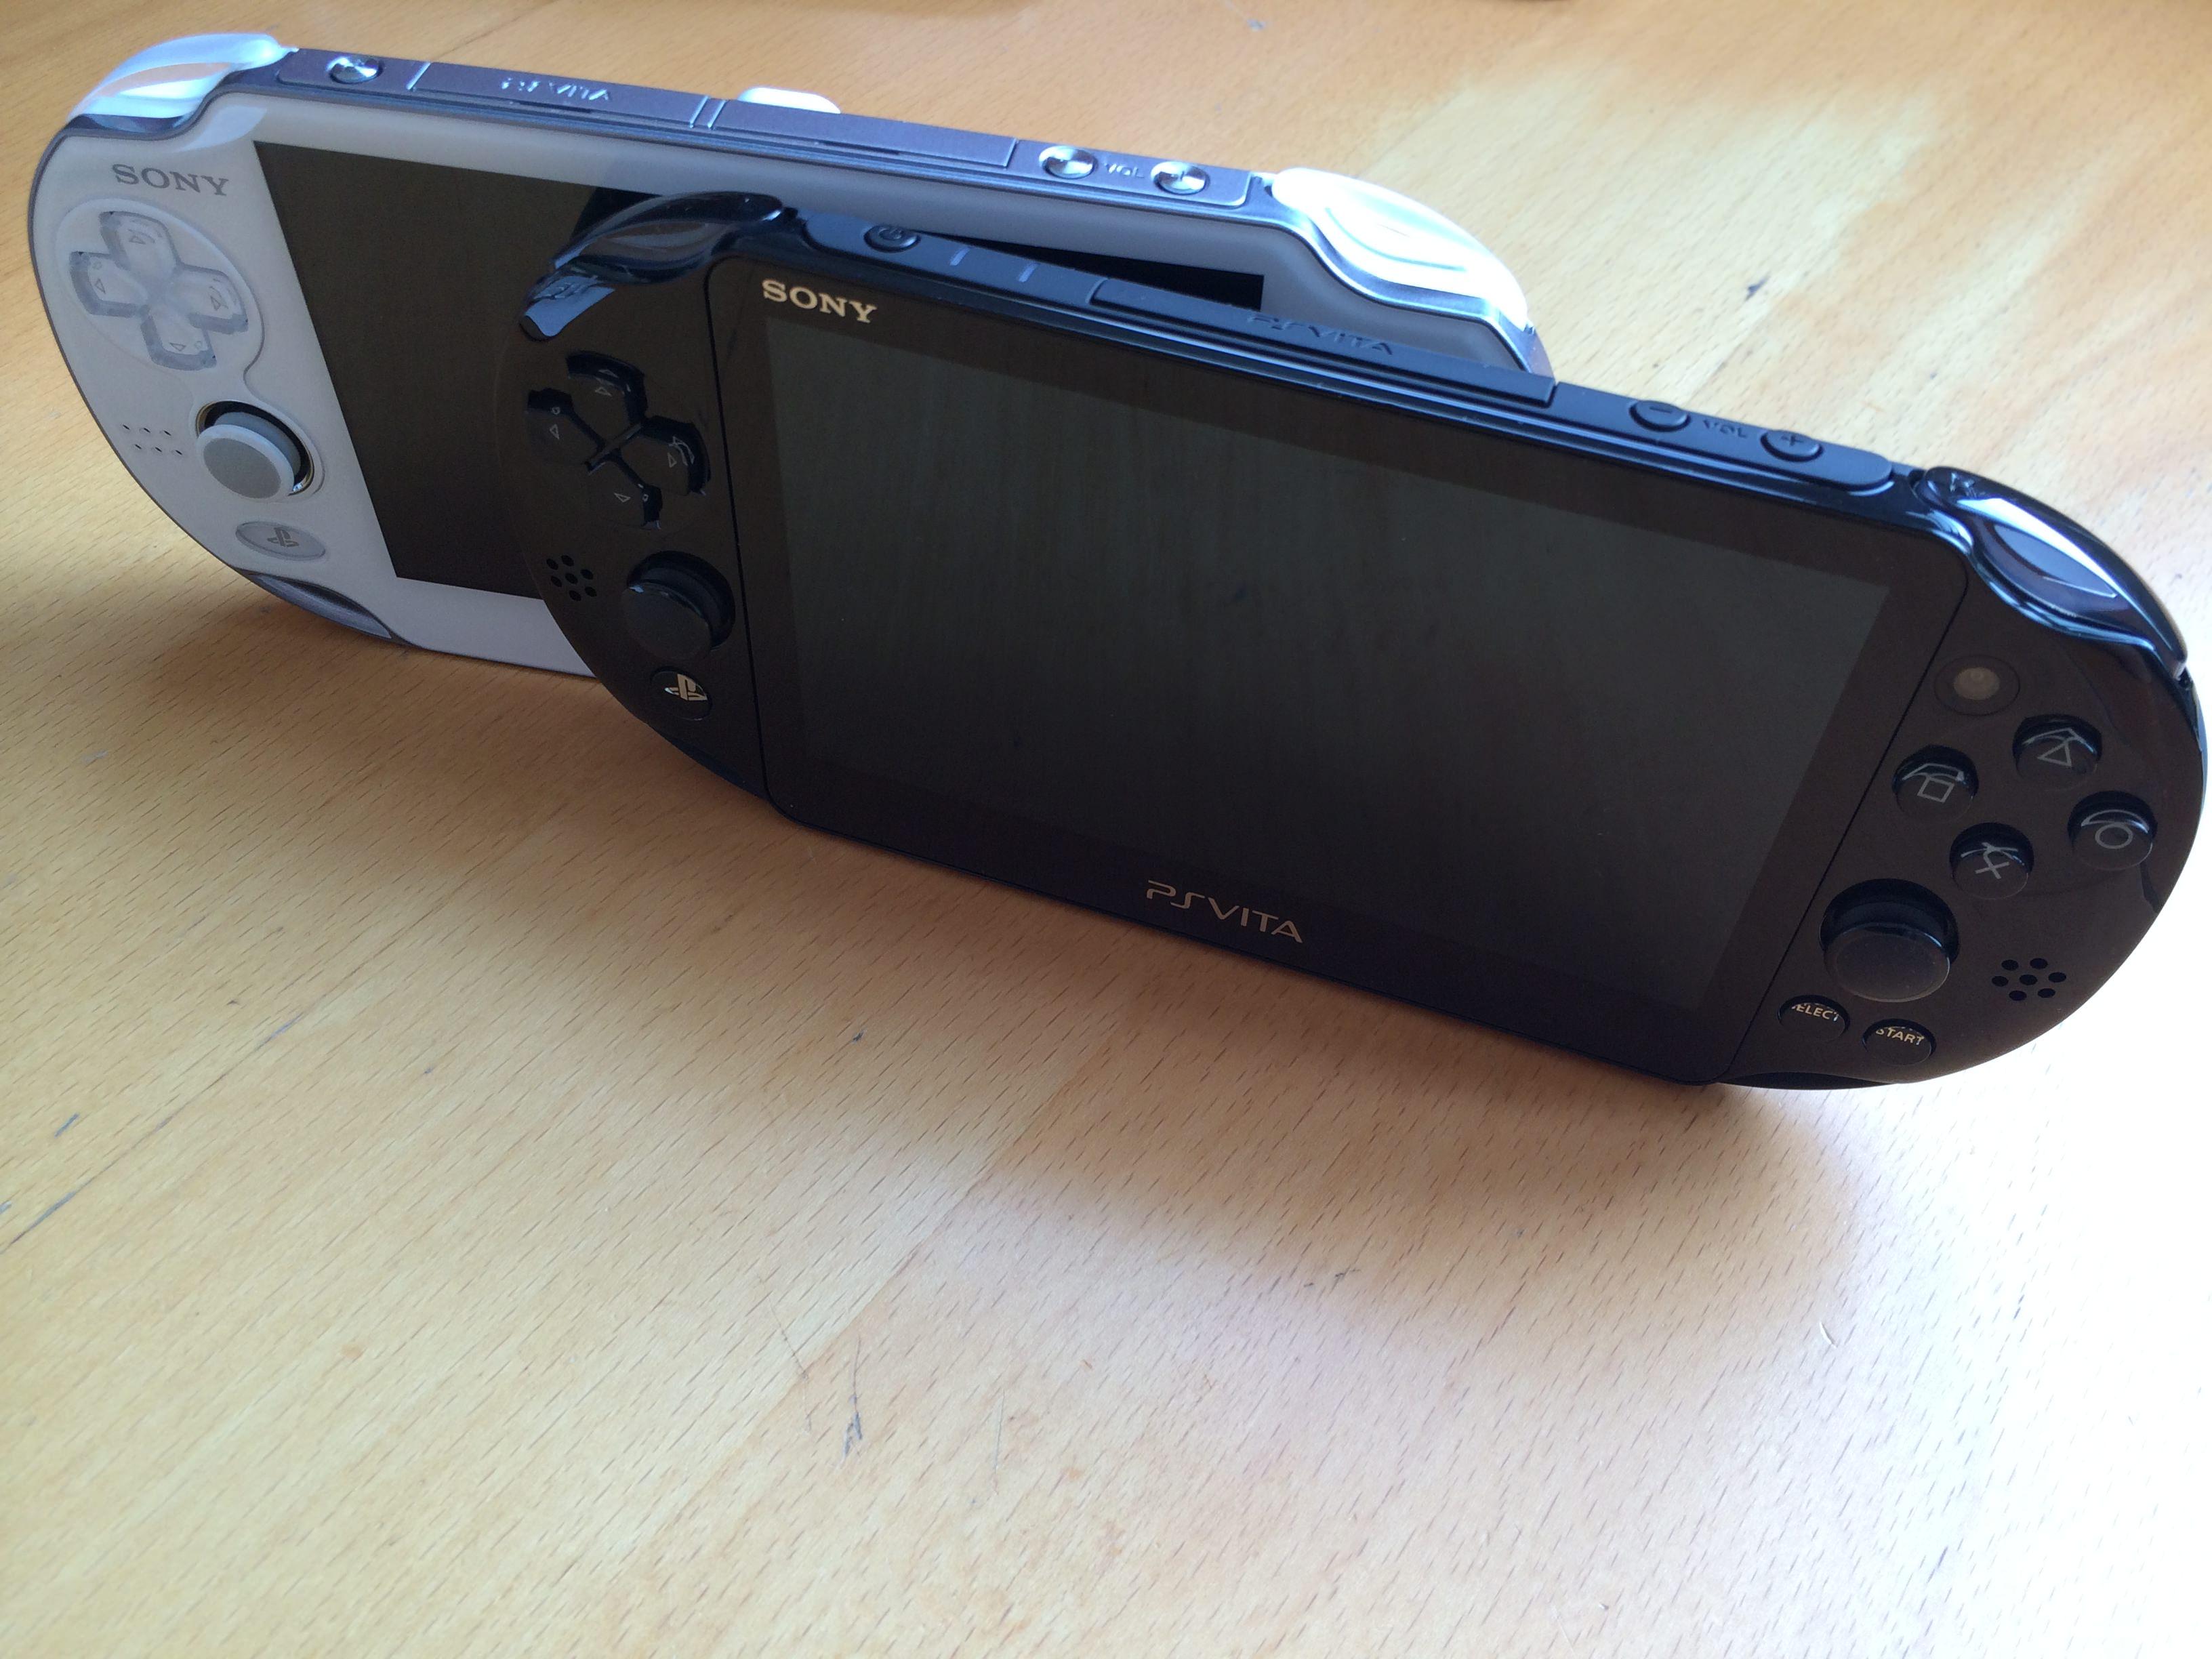 Playstation Vita Review Pch 2000 Zero Distraction